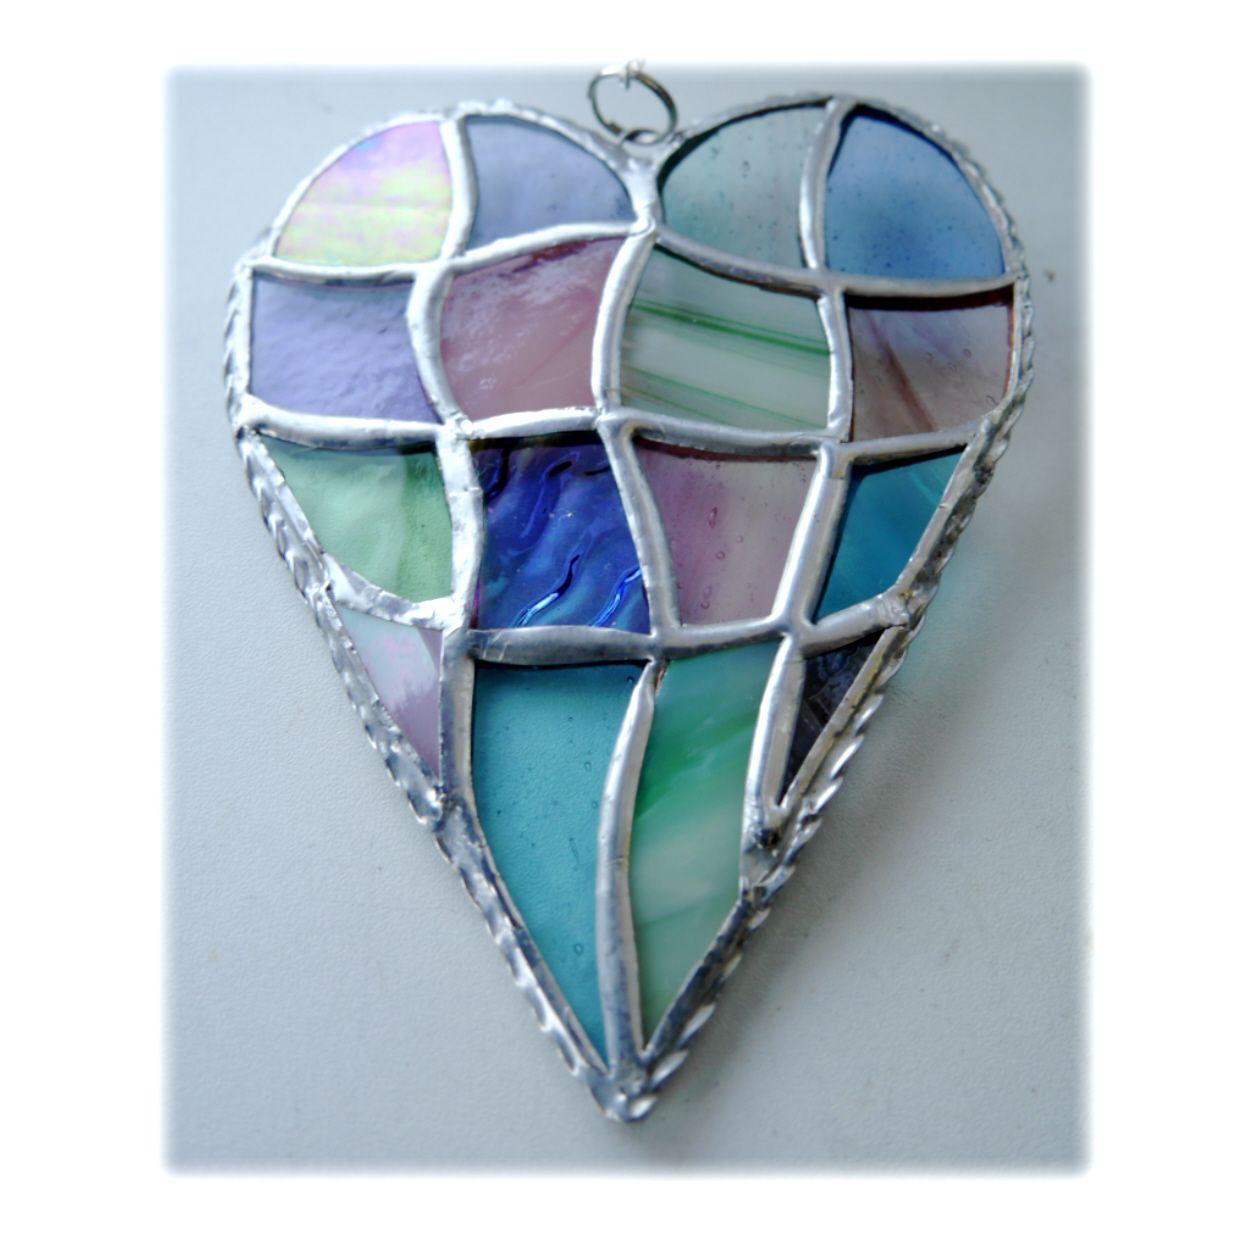 Patchwork Heart 041 Pastel #1905 @FOLKSY @190805 @16.00